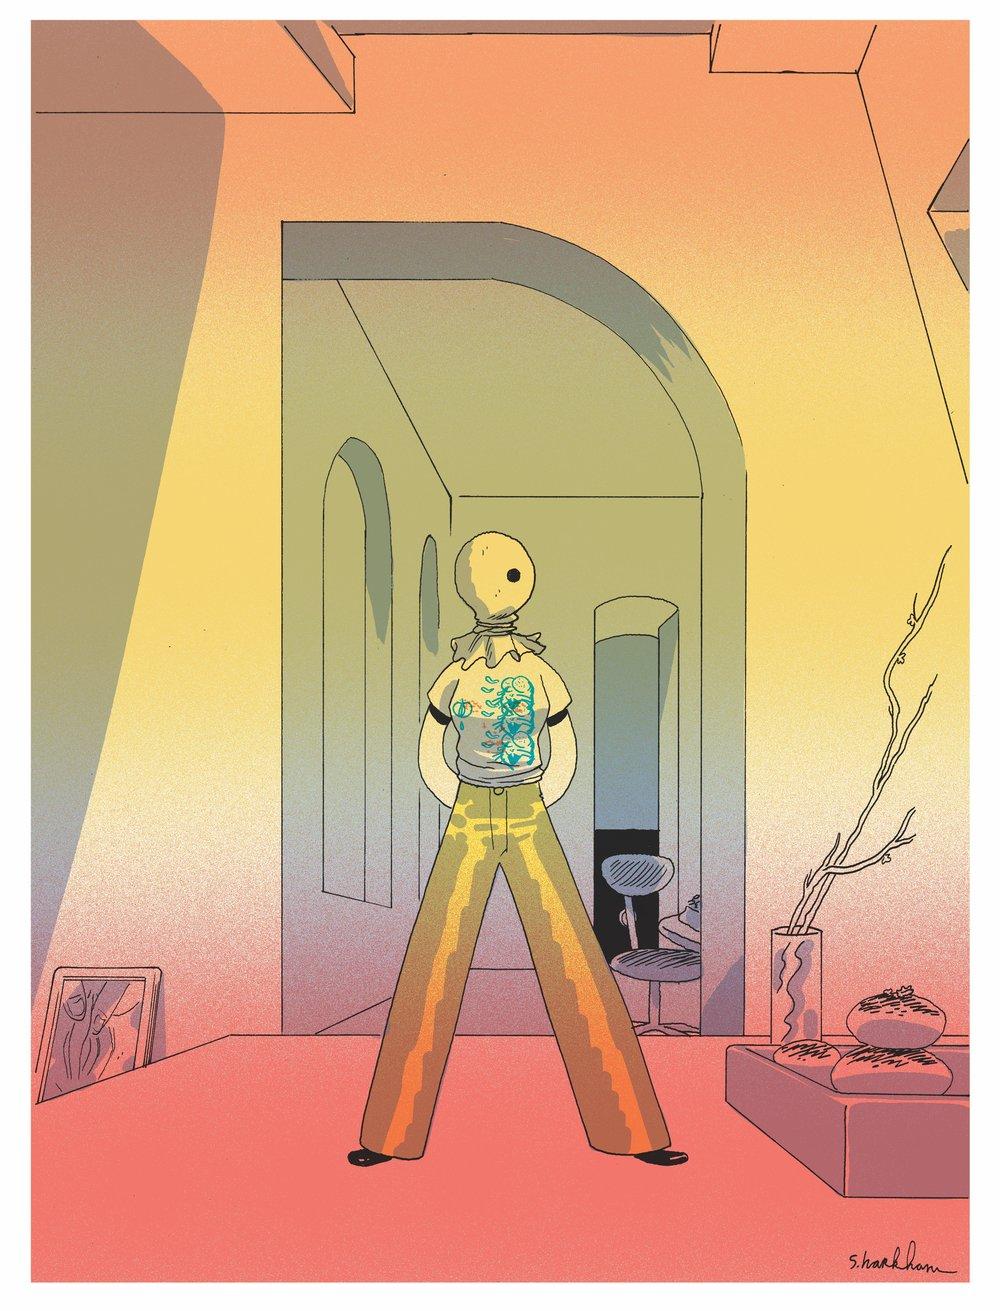 Carhartt_WIP_x_Brain_Dead_Sammy_Harkham_Comic_03.jpg